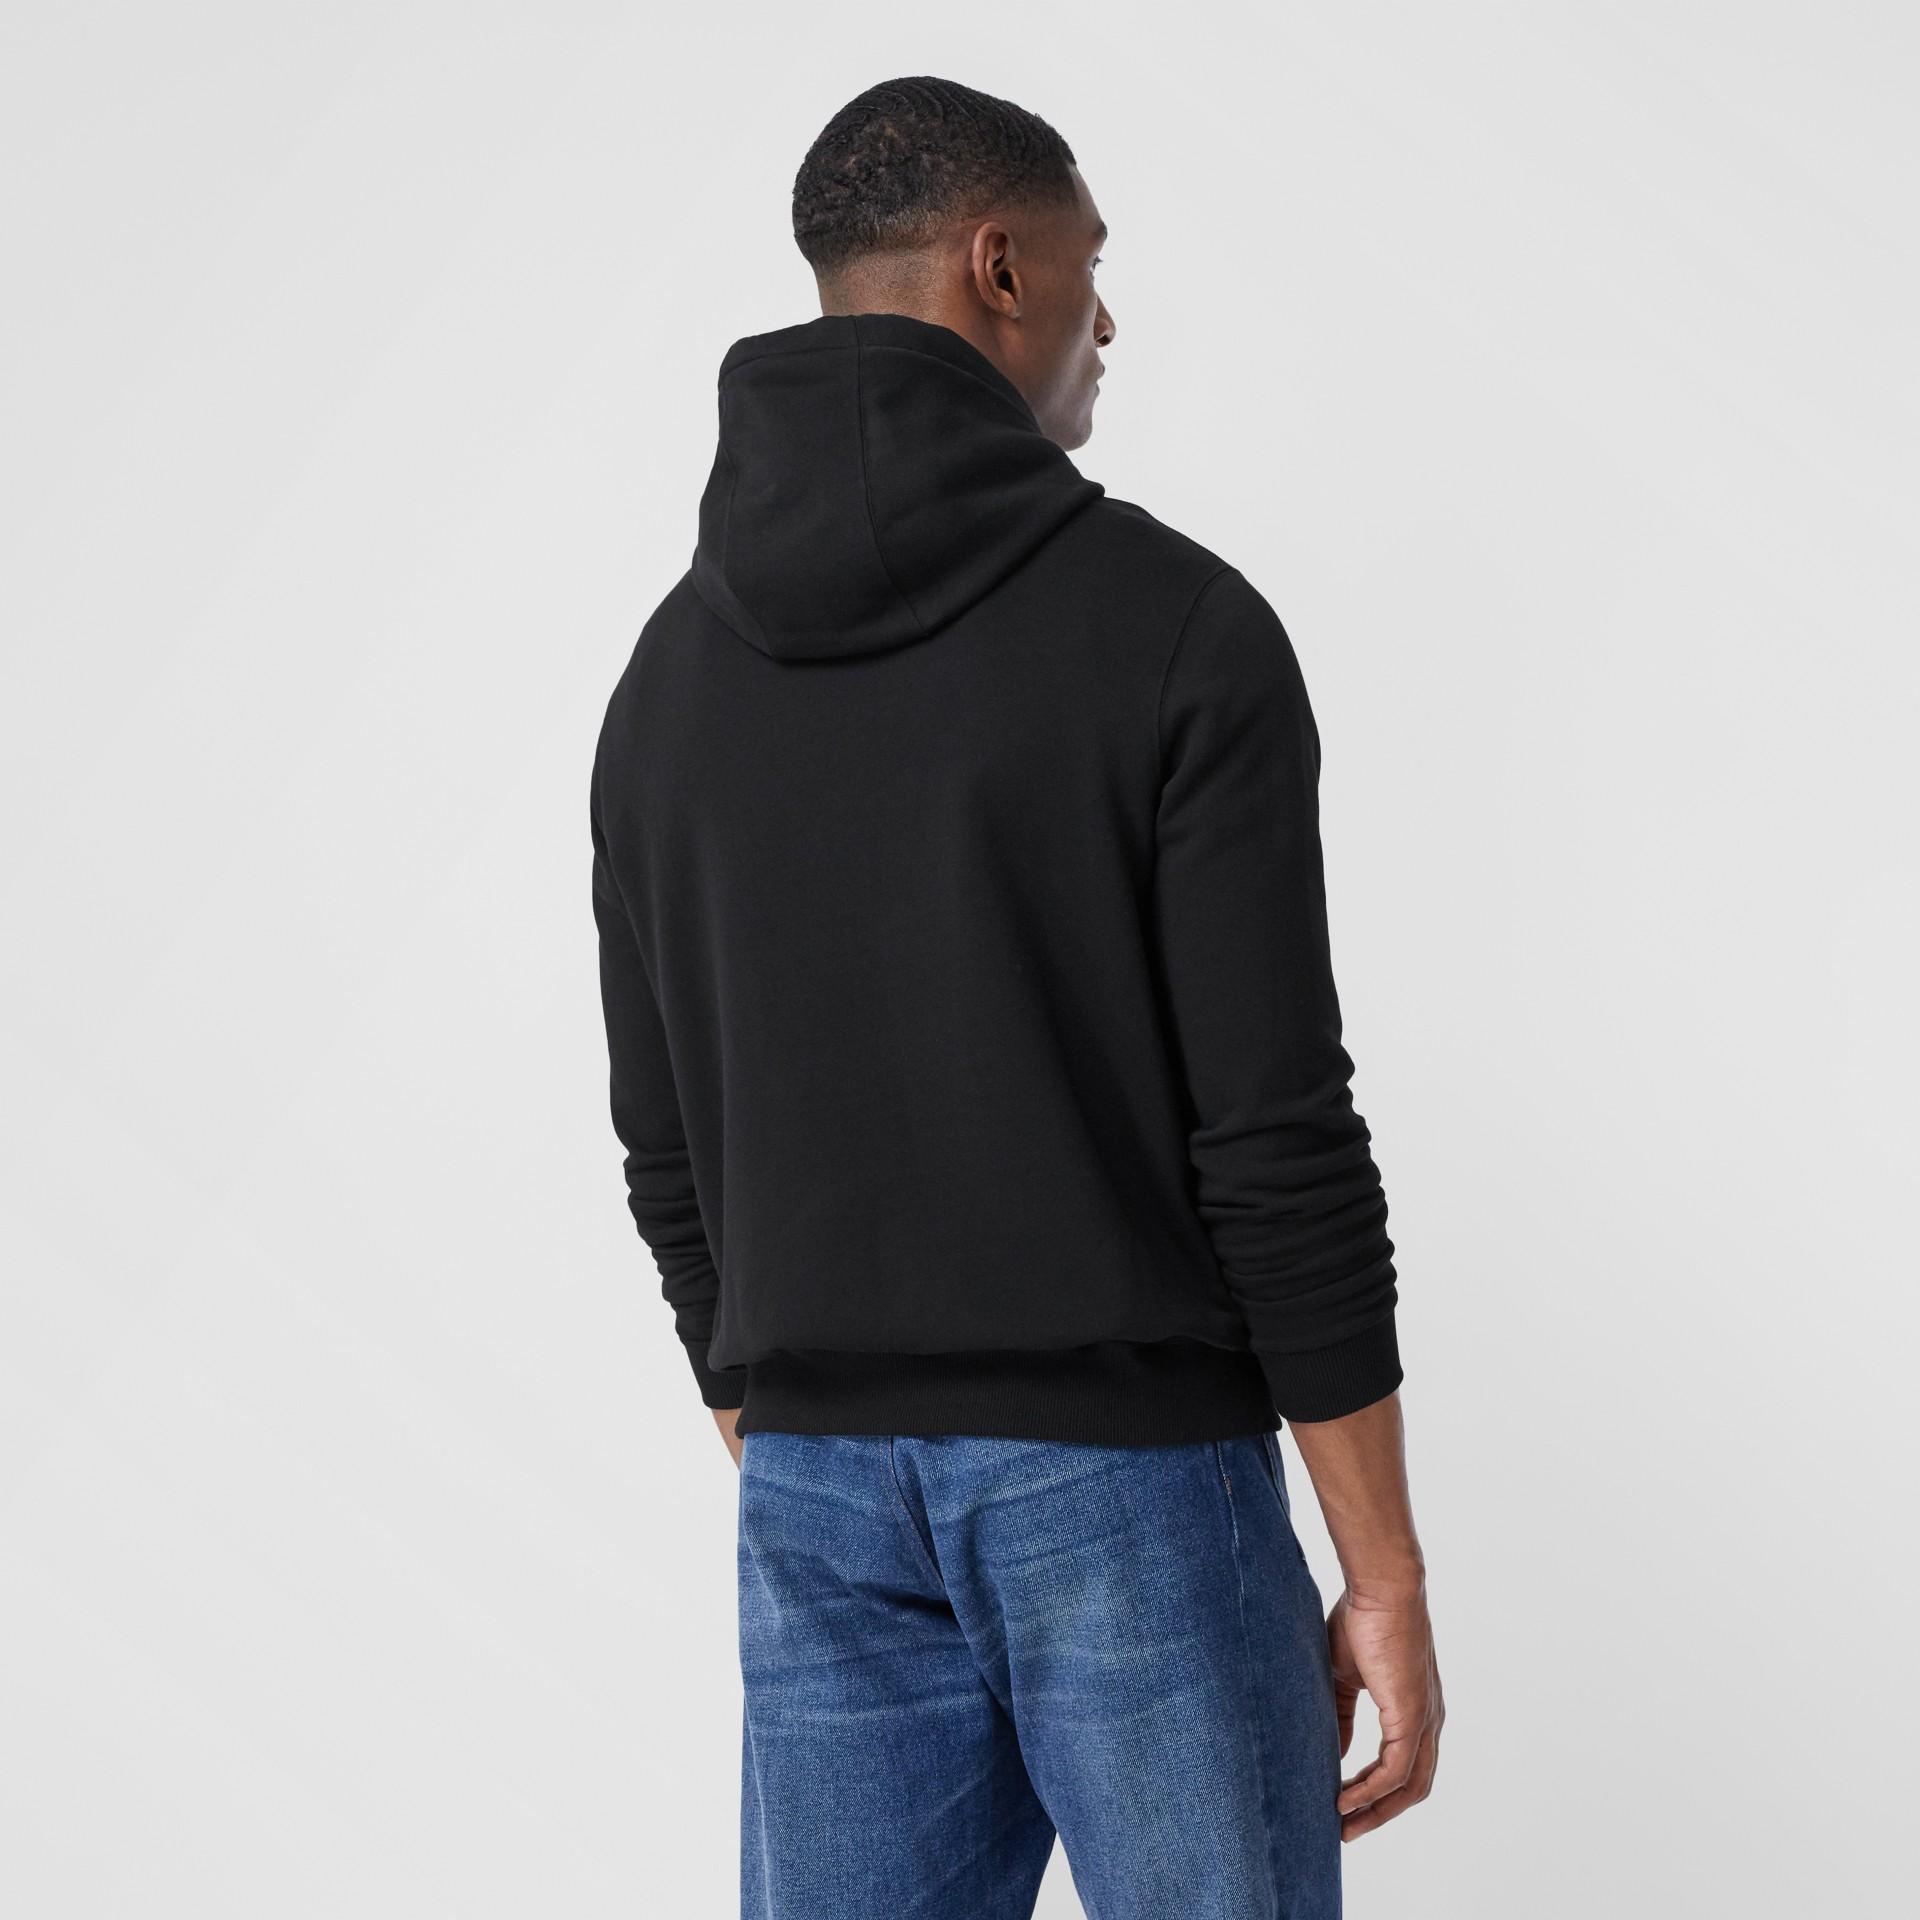 Monogram Motif Cotton Hoodie in Black - Men | Burberry - gallery image 2